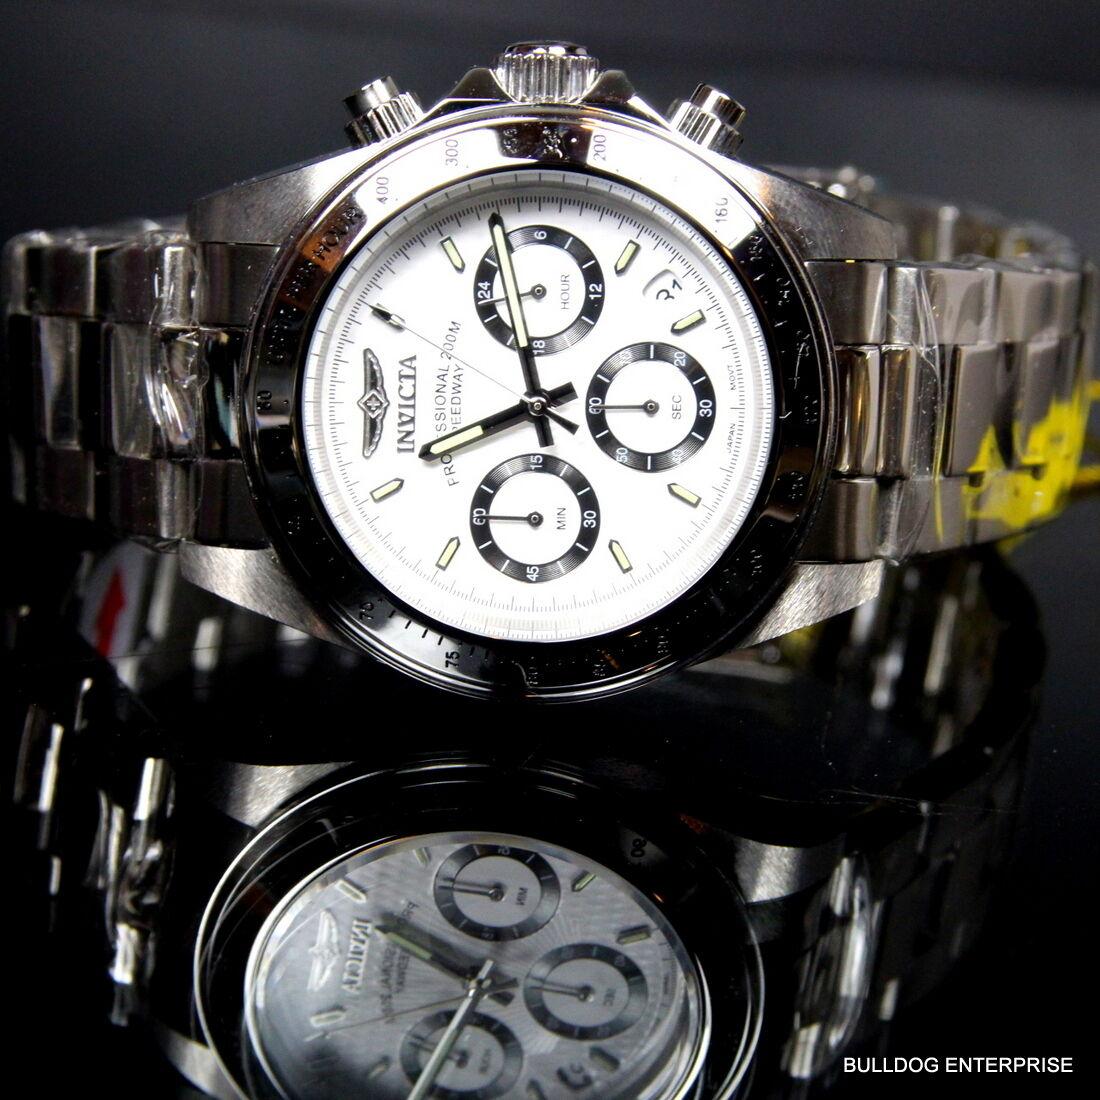 $99.99 - Mens Invicta Speedway Daytona Stainless Steel White Chronograph 200m Watch New